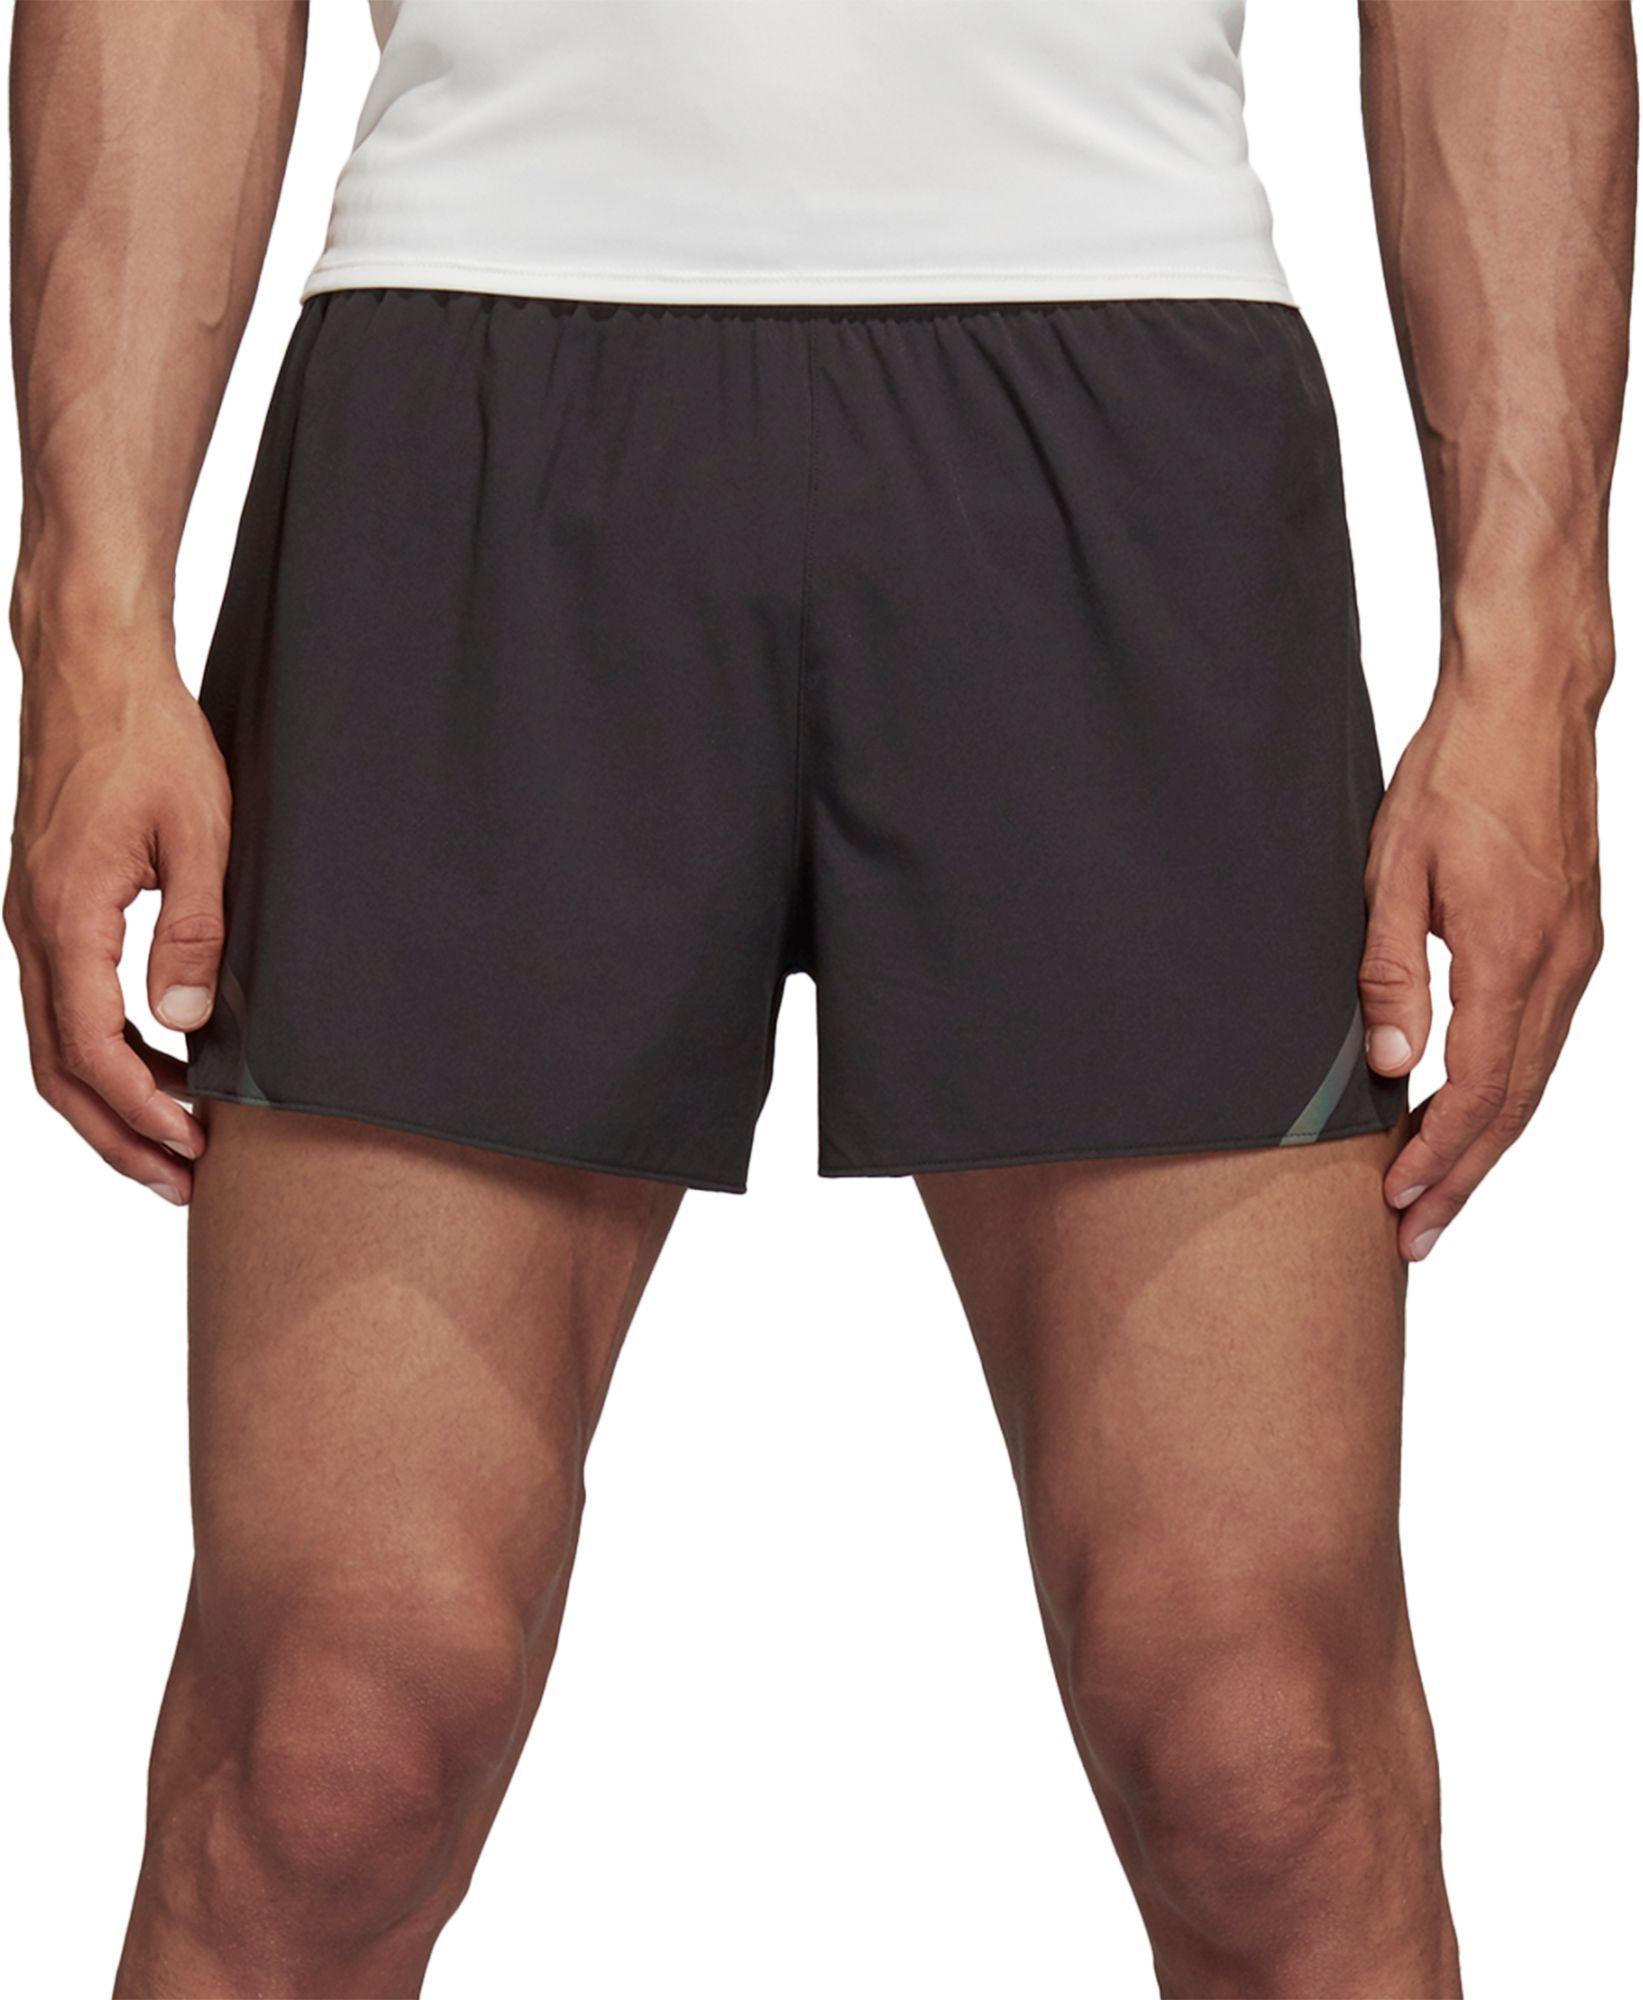 new styles 79914 0f000 adidas Men s Supernova Running Shorts, Black